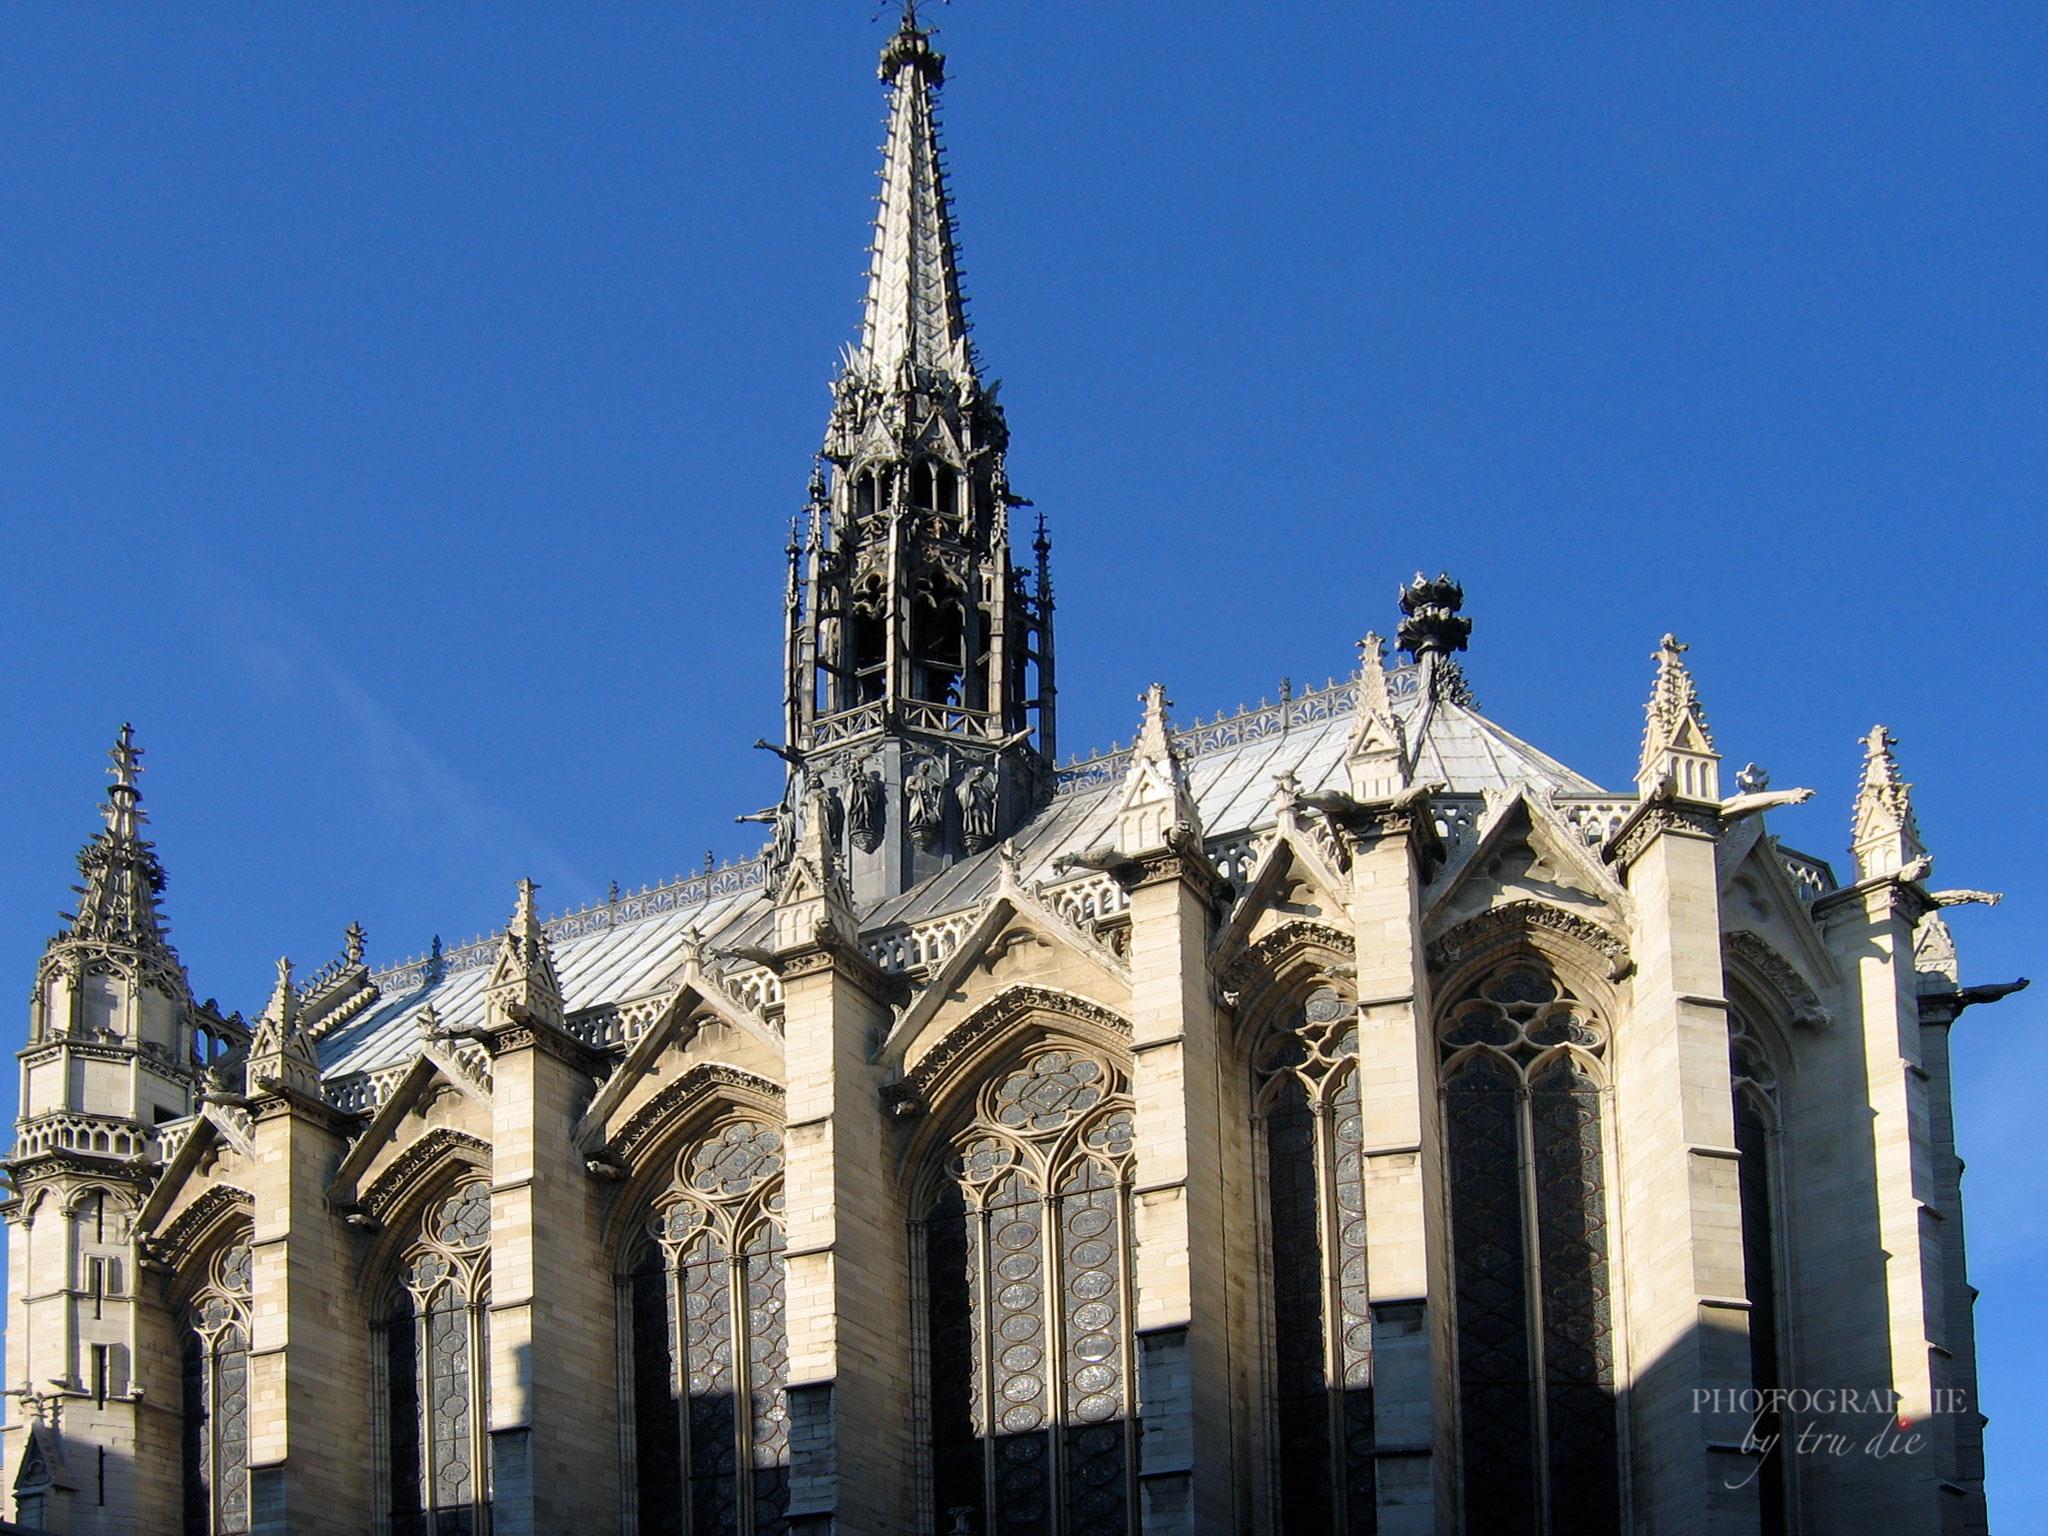 Bild: Sainte-Chapelle in Paris